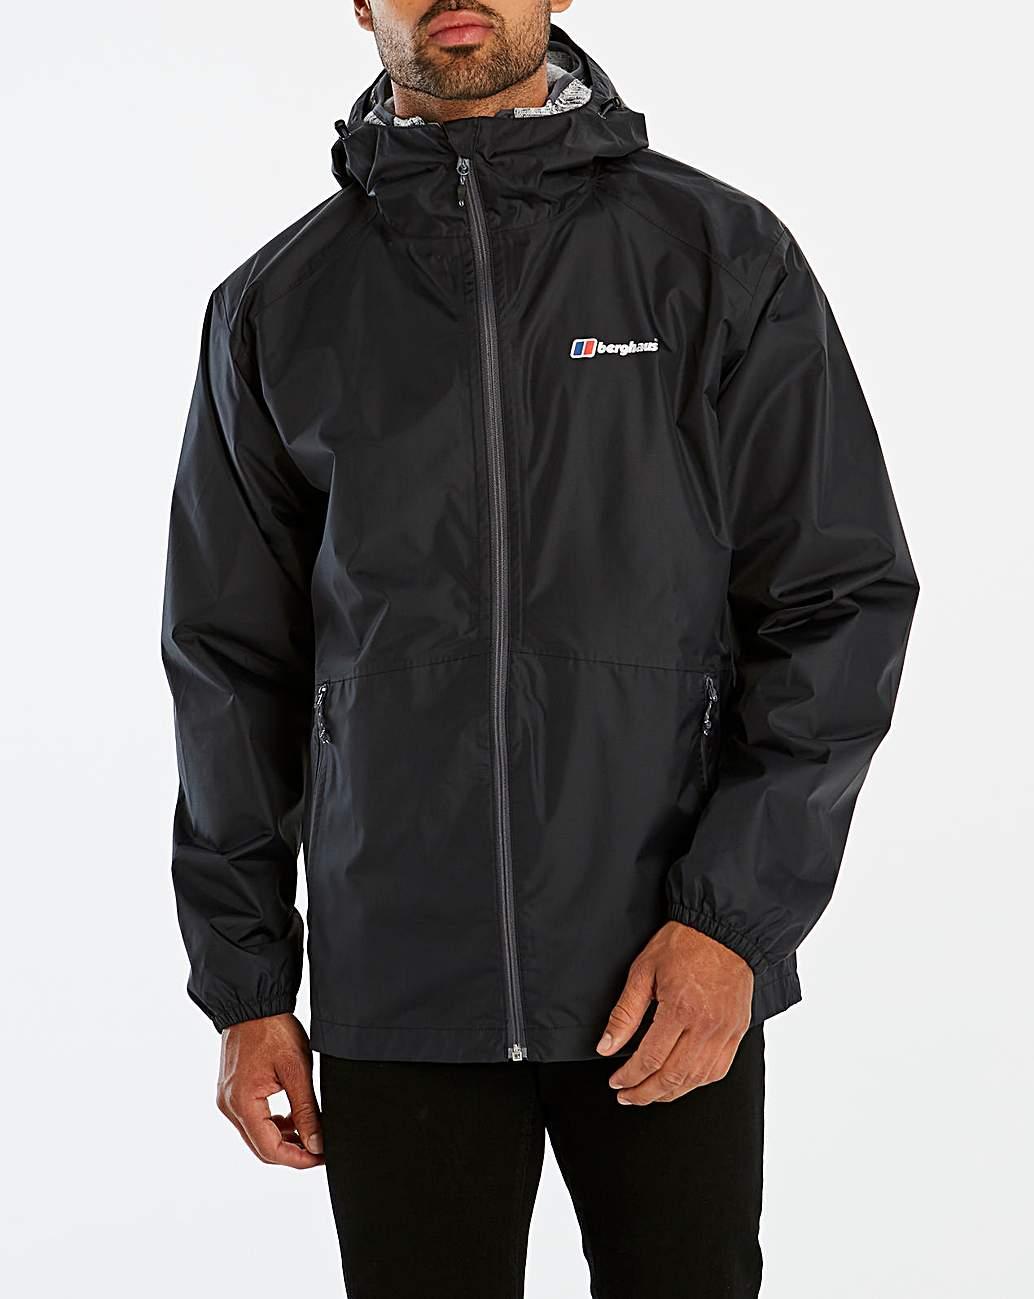 great prices wholesale sales new styles Berghaus Deluge Light Waterproof Jacket